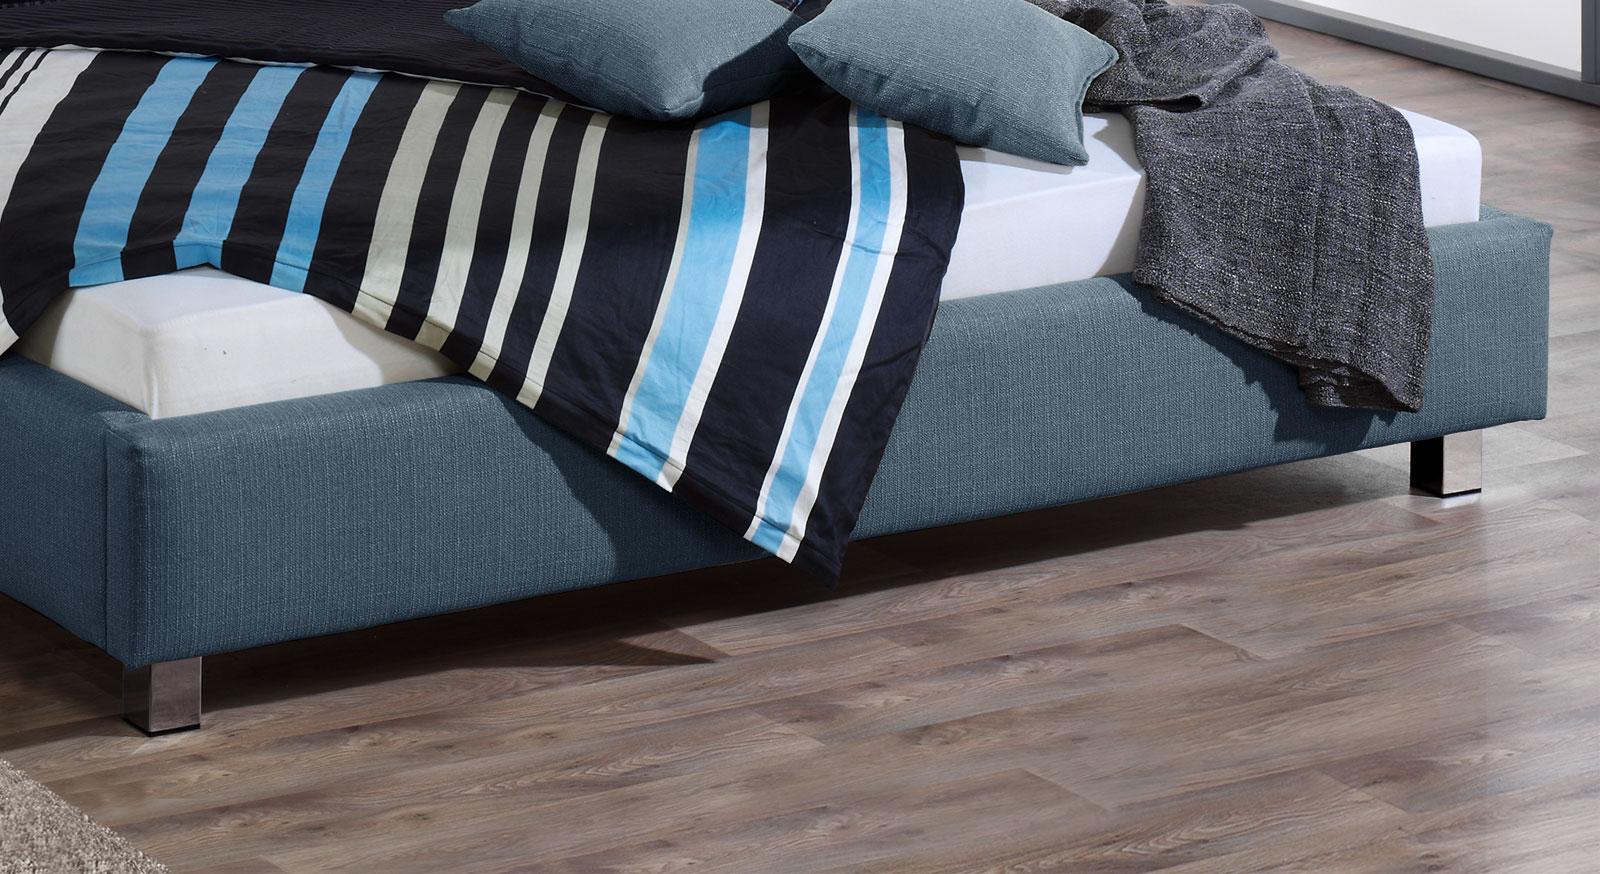 Modernes Bett El Coco mit verchromten Metallfüßen